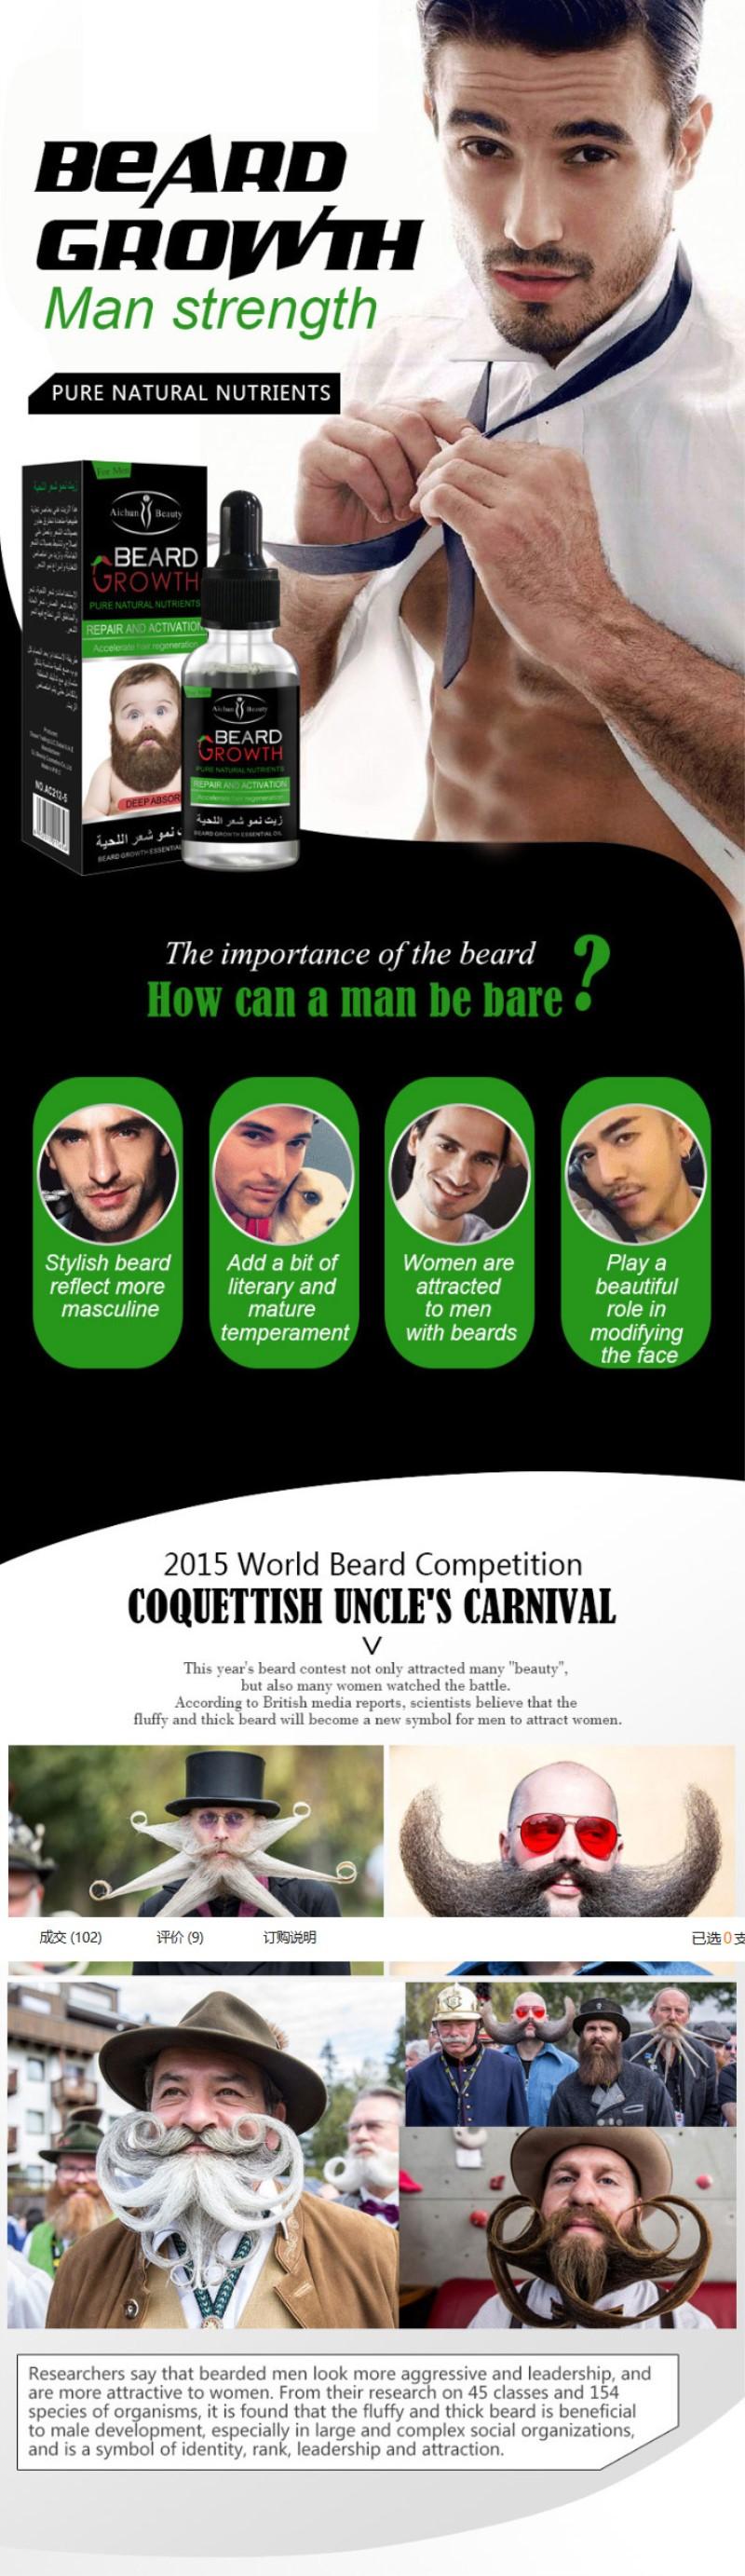 Professional_Men_Beard_Growth_Enhancer_Facial_Nutrition_Moustache_Grow_Beard_Shaping_Tool_Beard_care_products_1